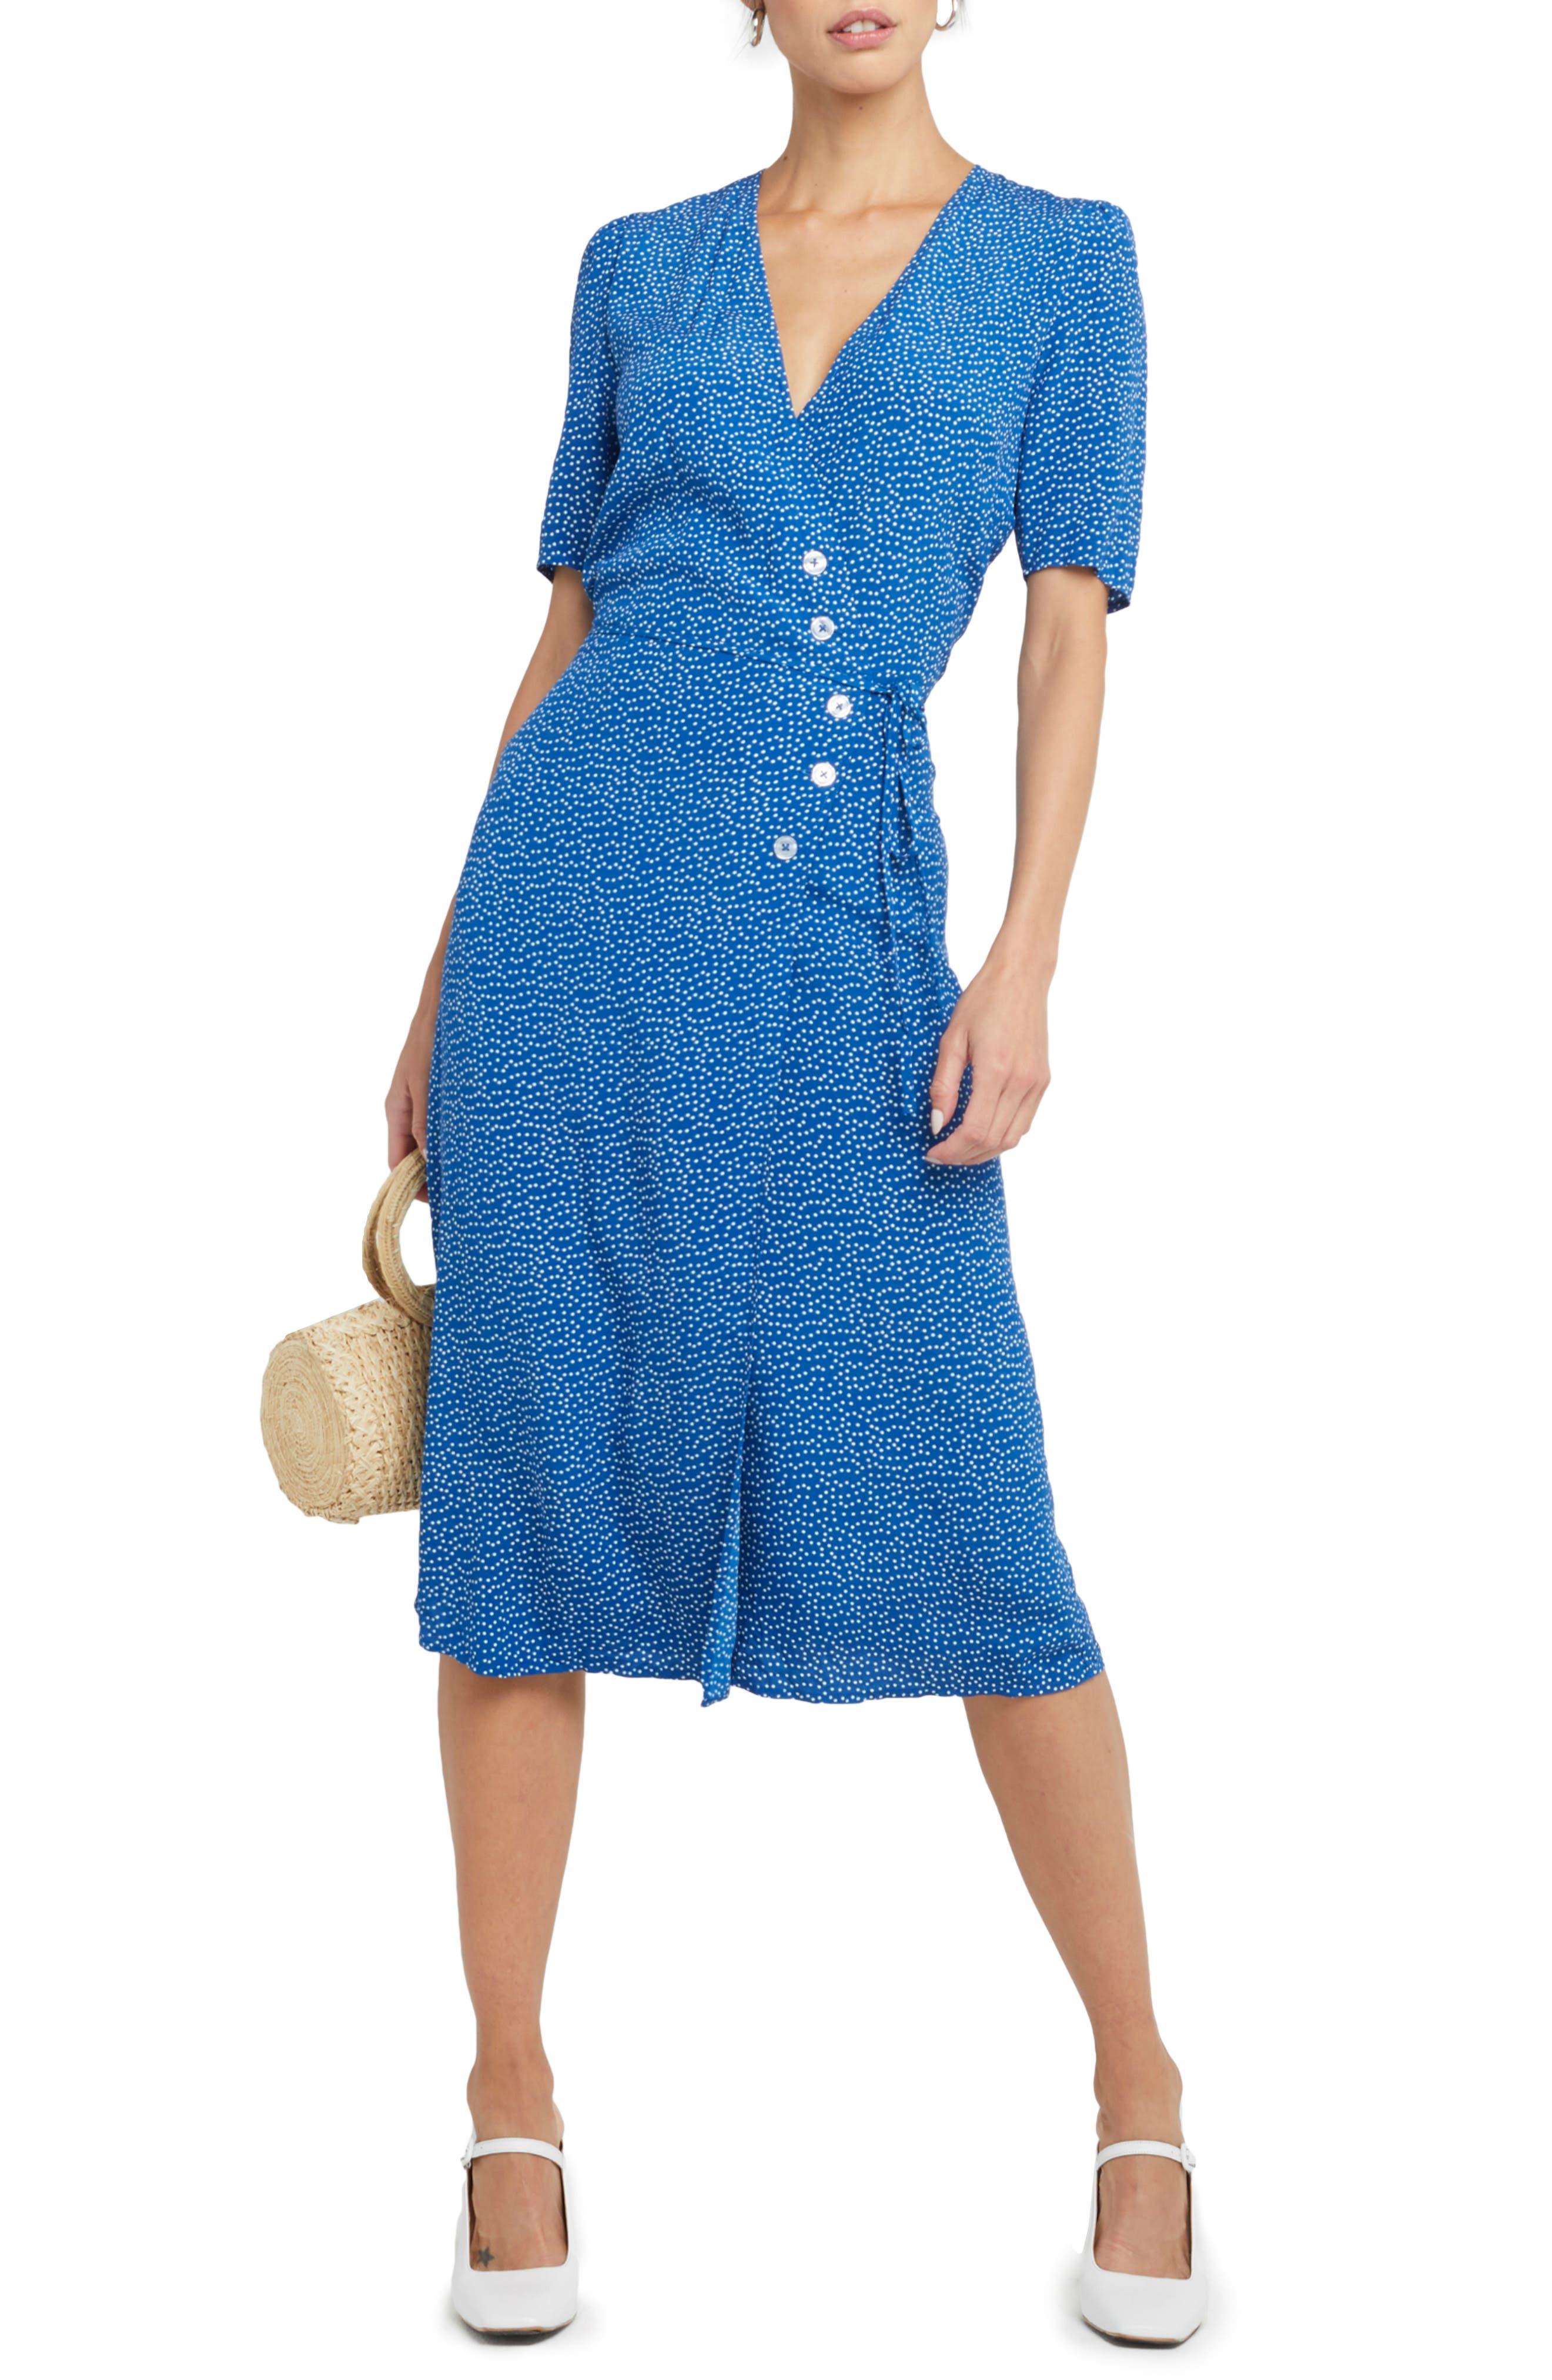 1930s Dresses | 30s Art Deco Dress Womens Kourt Misty Wrap Front Dot Midi Dress $138.00 AT vintagedancer.com